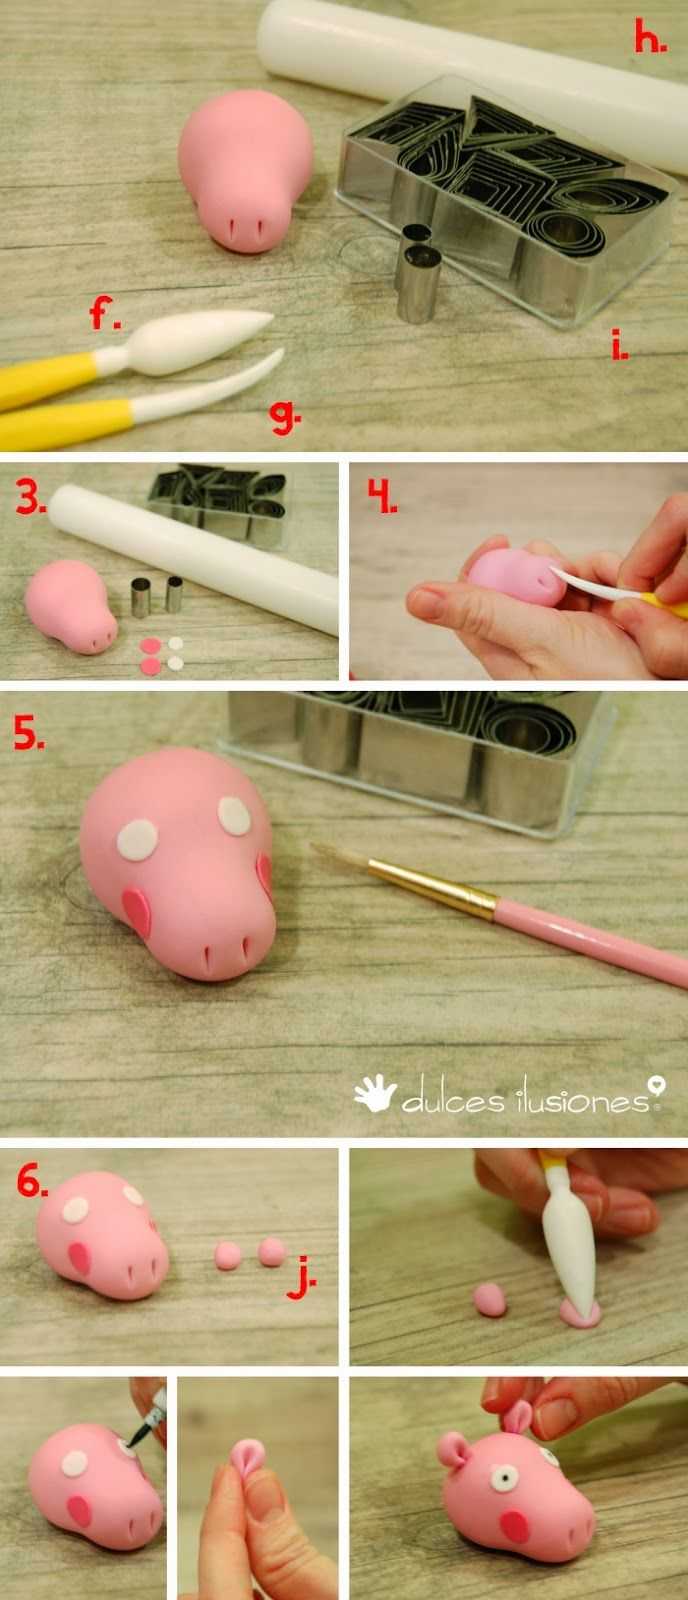 http://blogdulcesilusiones.blogspot.ru/2013/12/paso-paso-modelado-peppa-pig.html